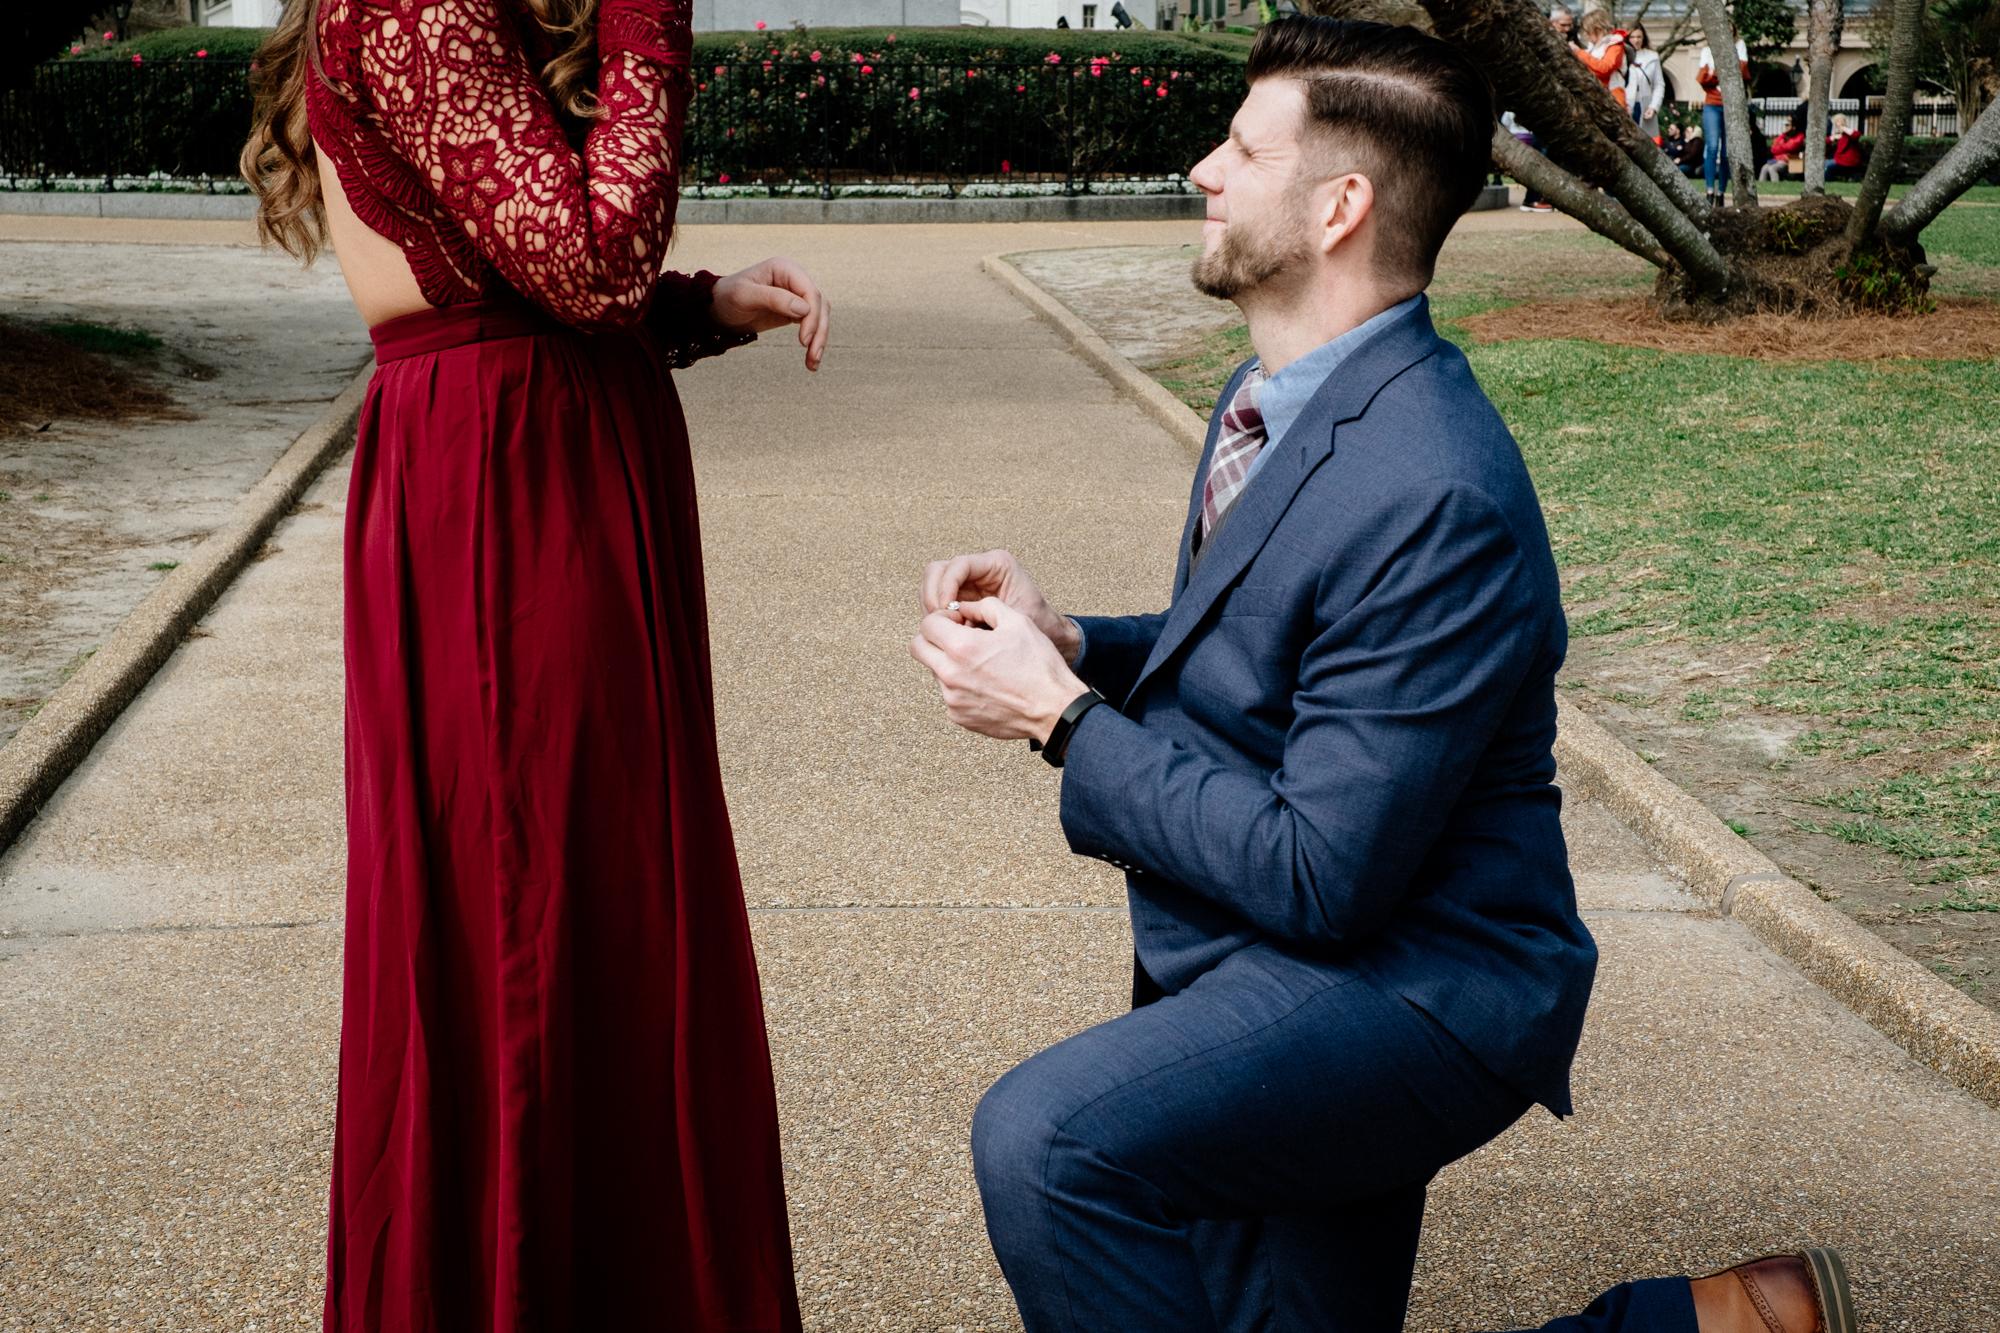 Jen_Montgomery_Photography_Angela_Brian_Engagement_Proposal_FB-11.jpg